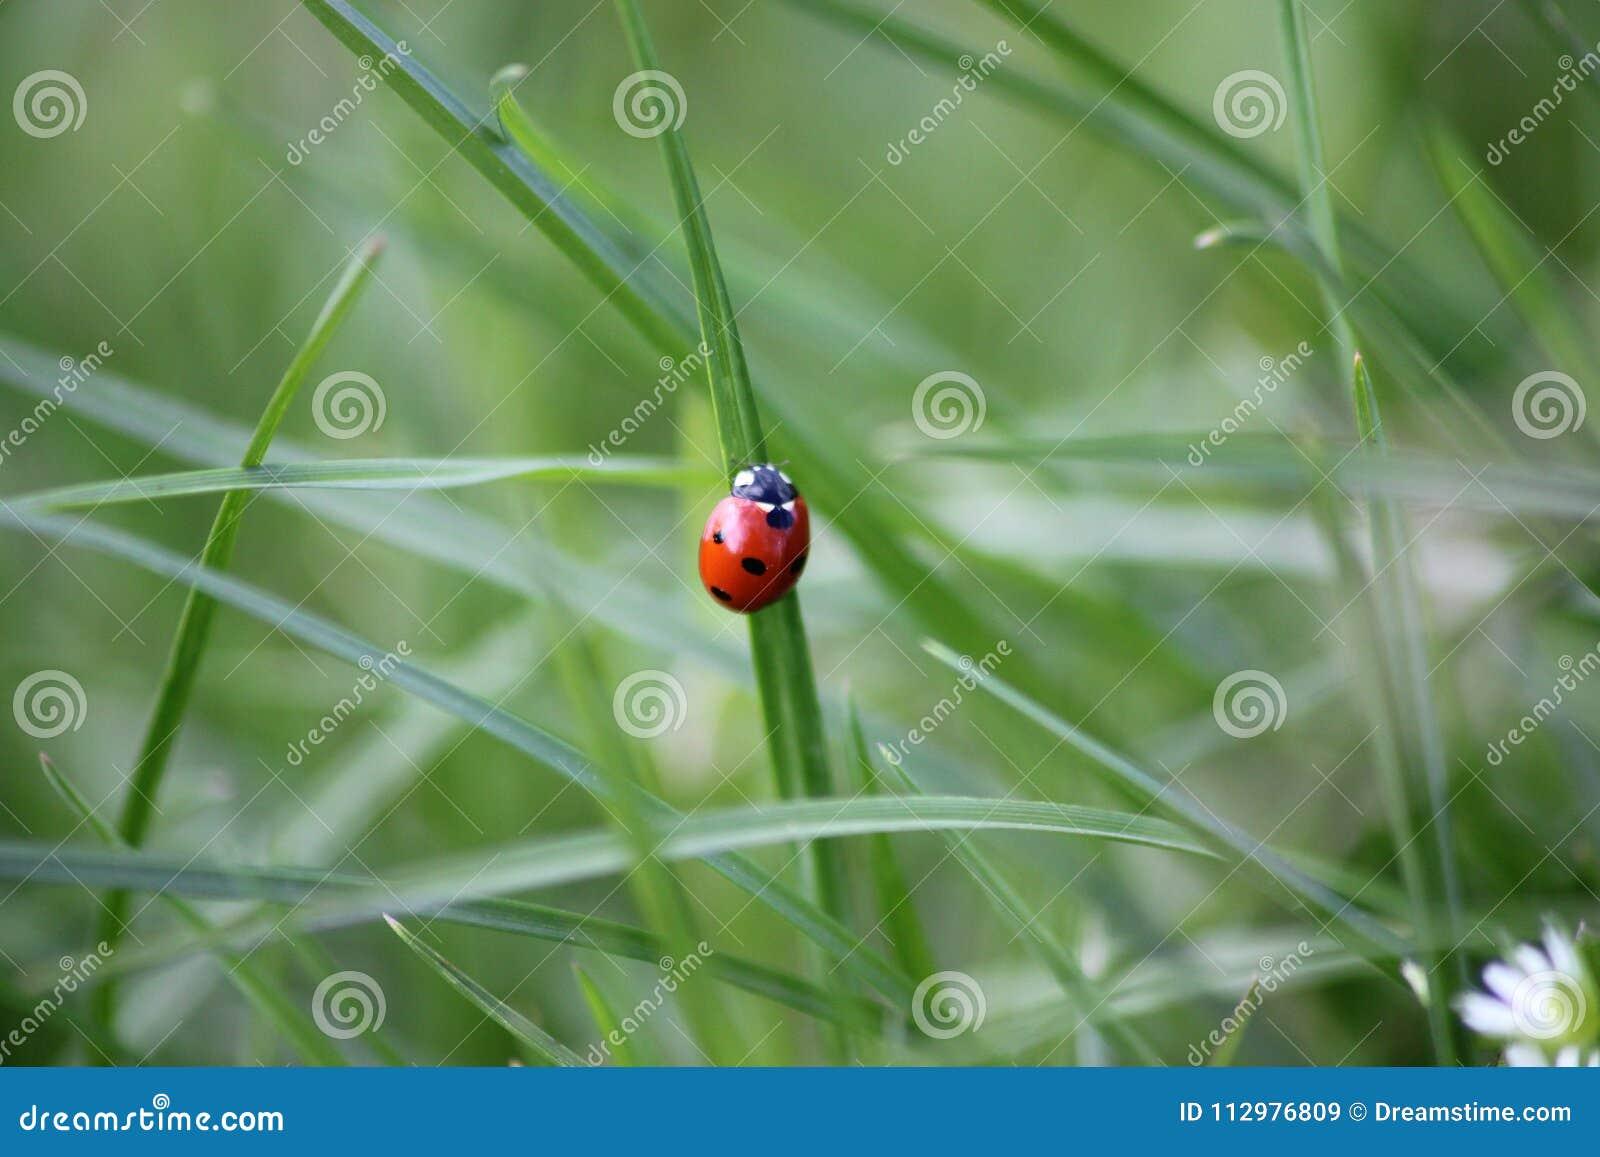 Ladybug on a green field